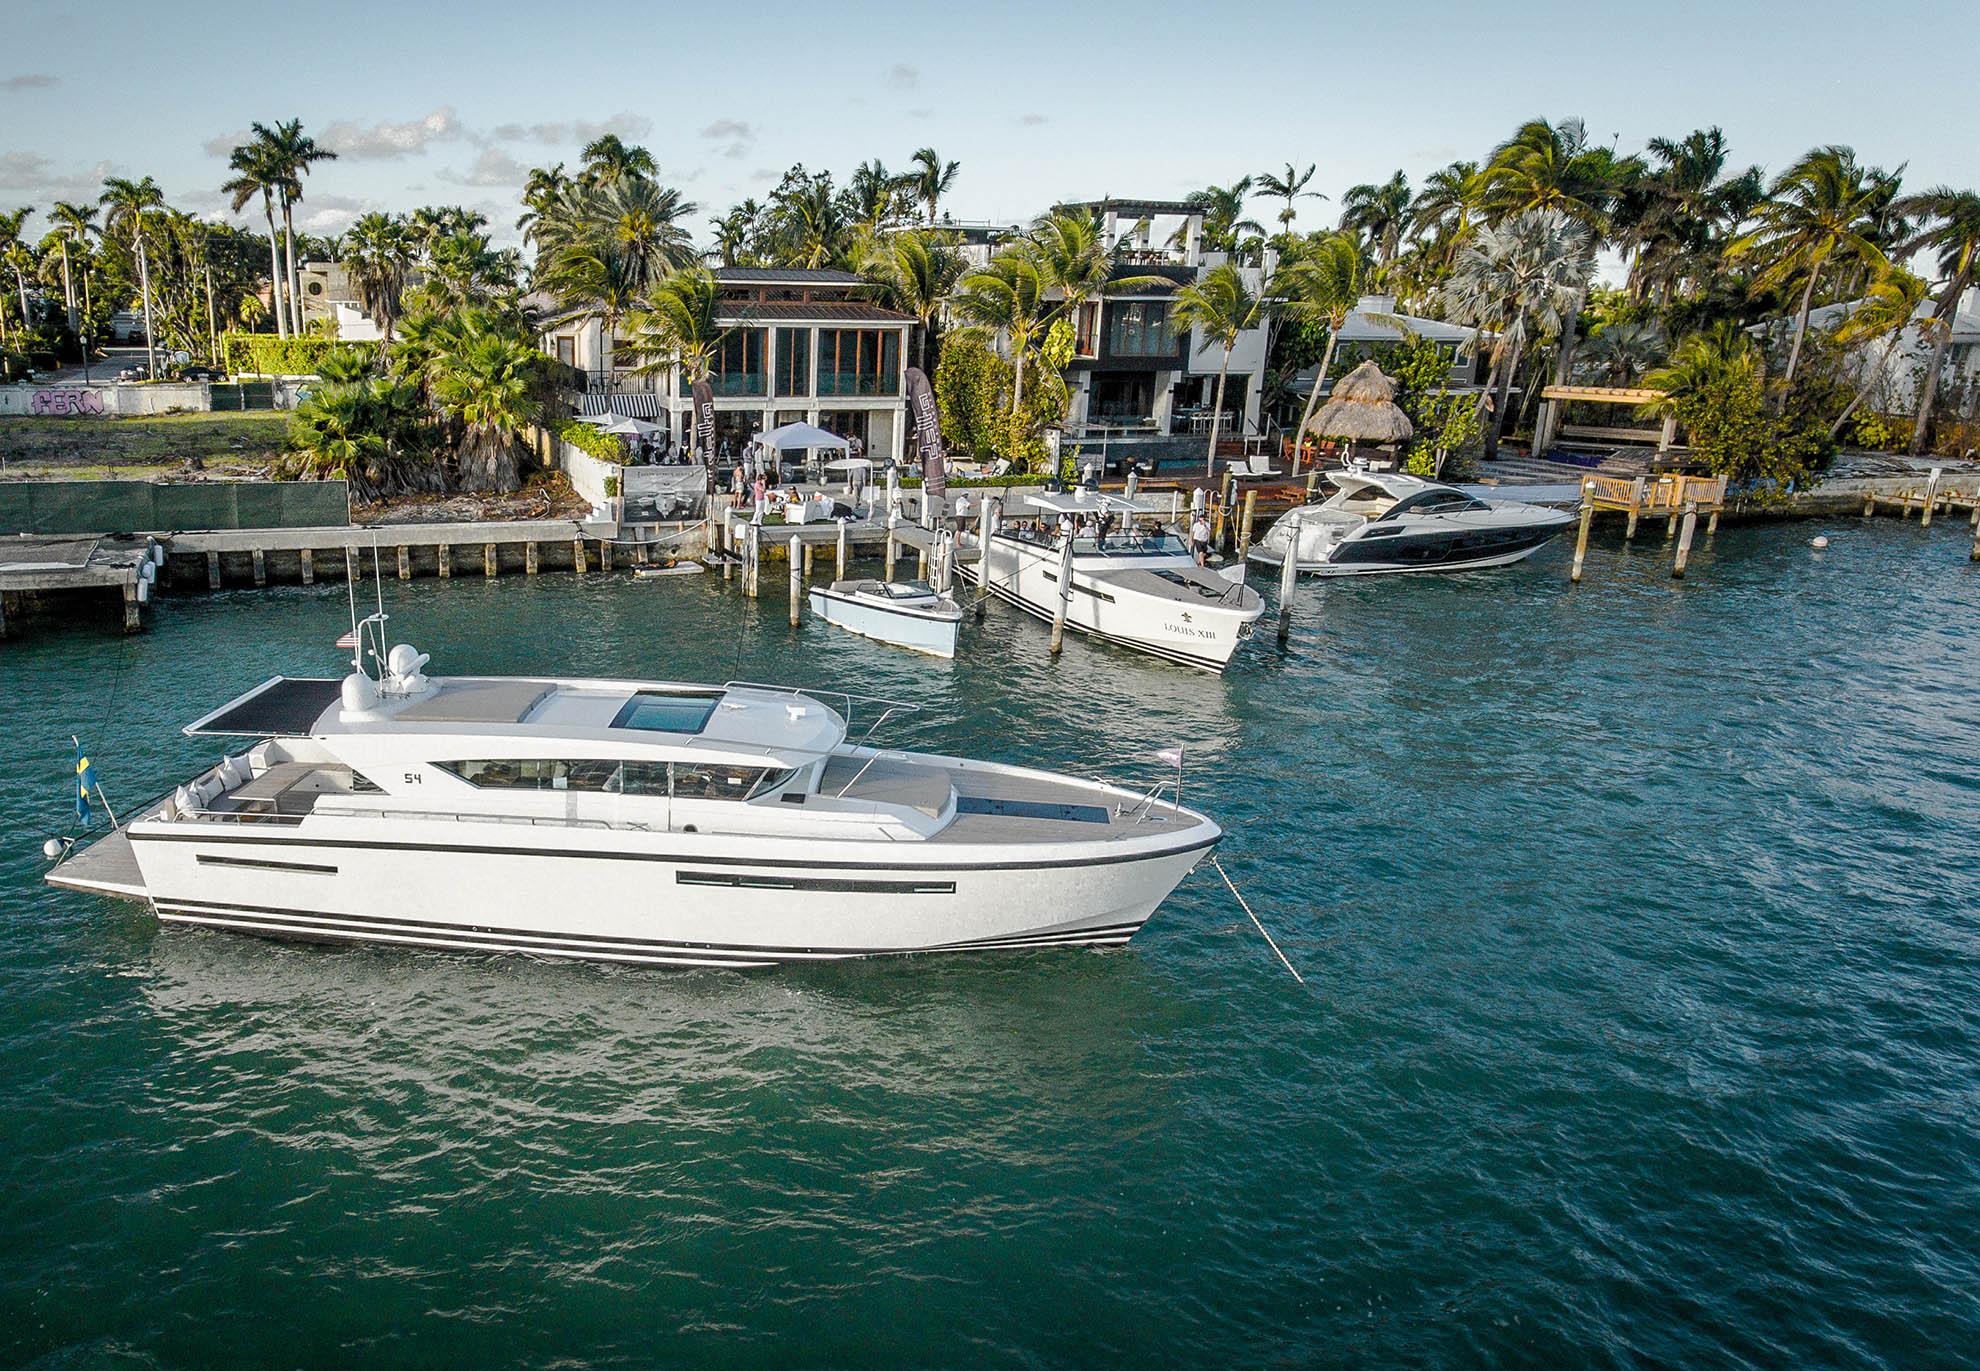 bg-04 – Yacht Creators